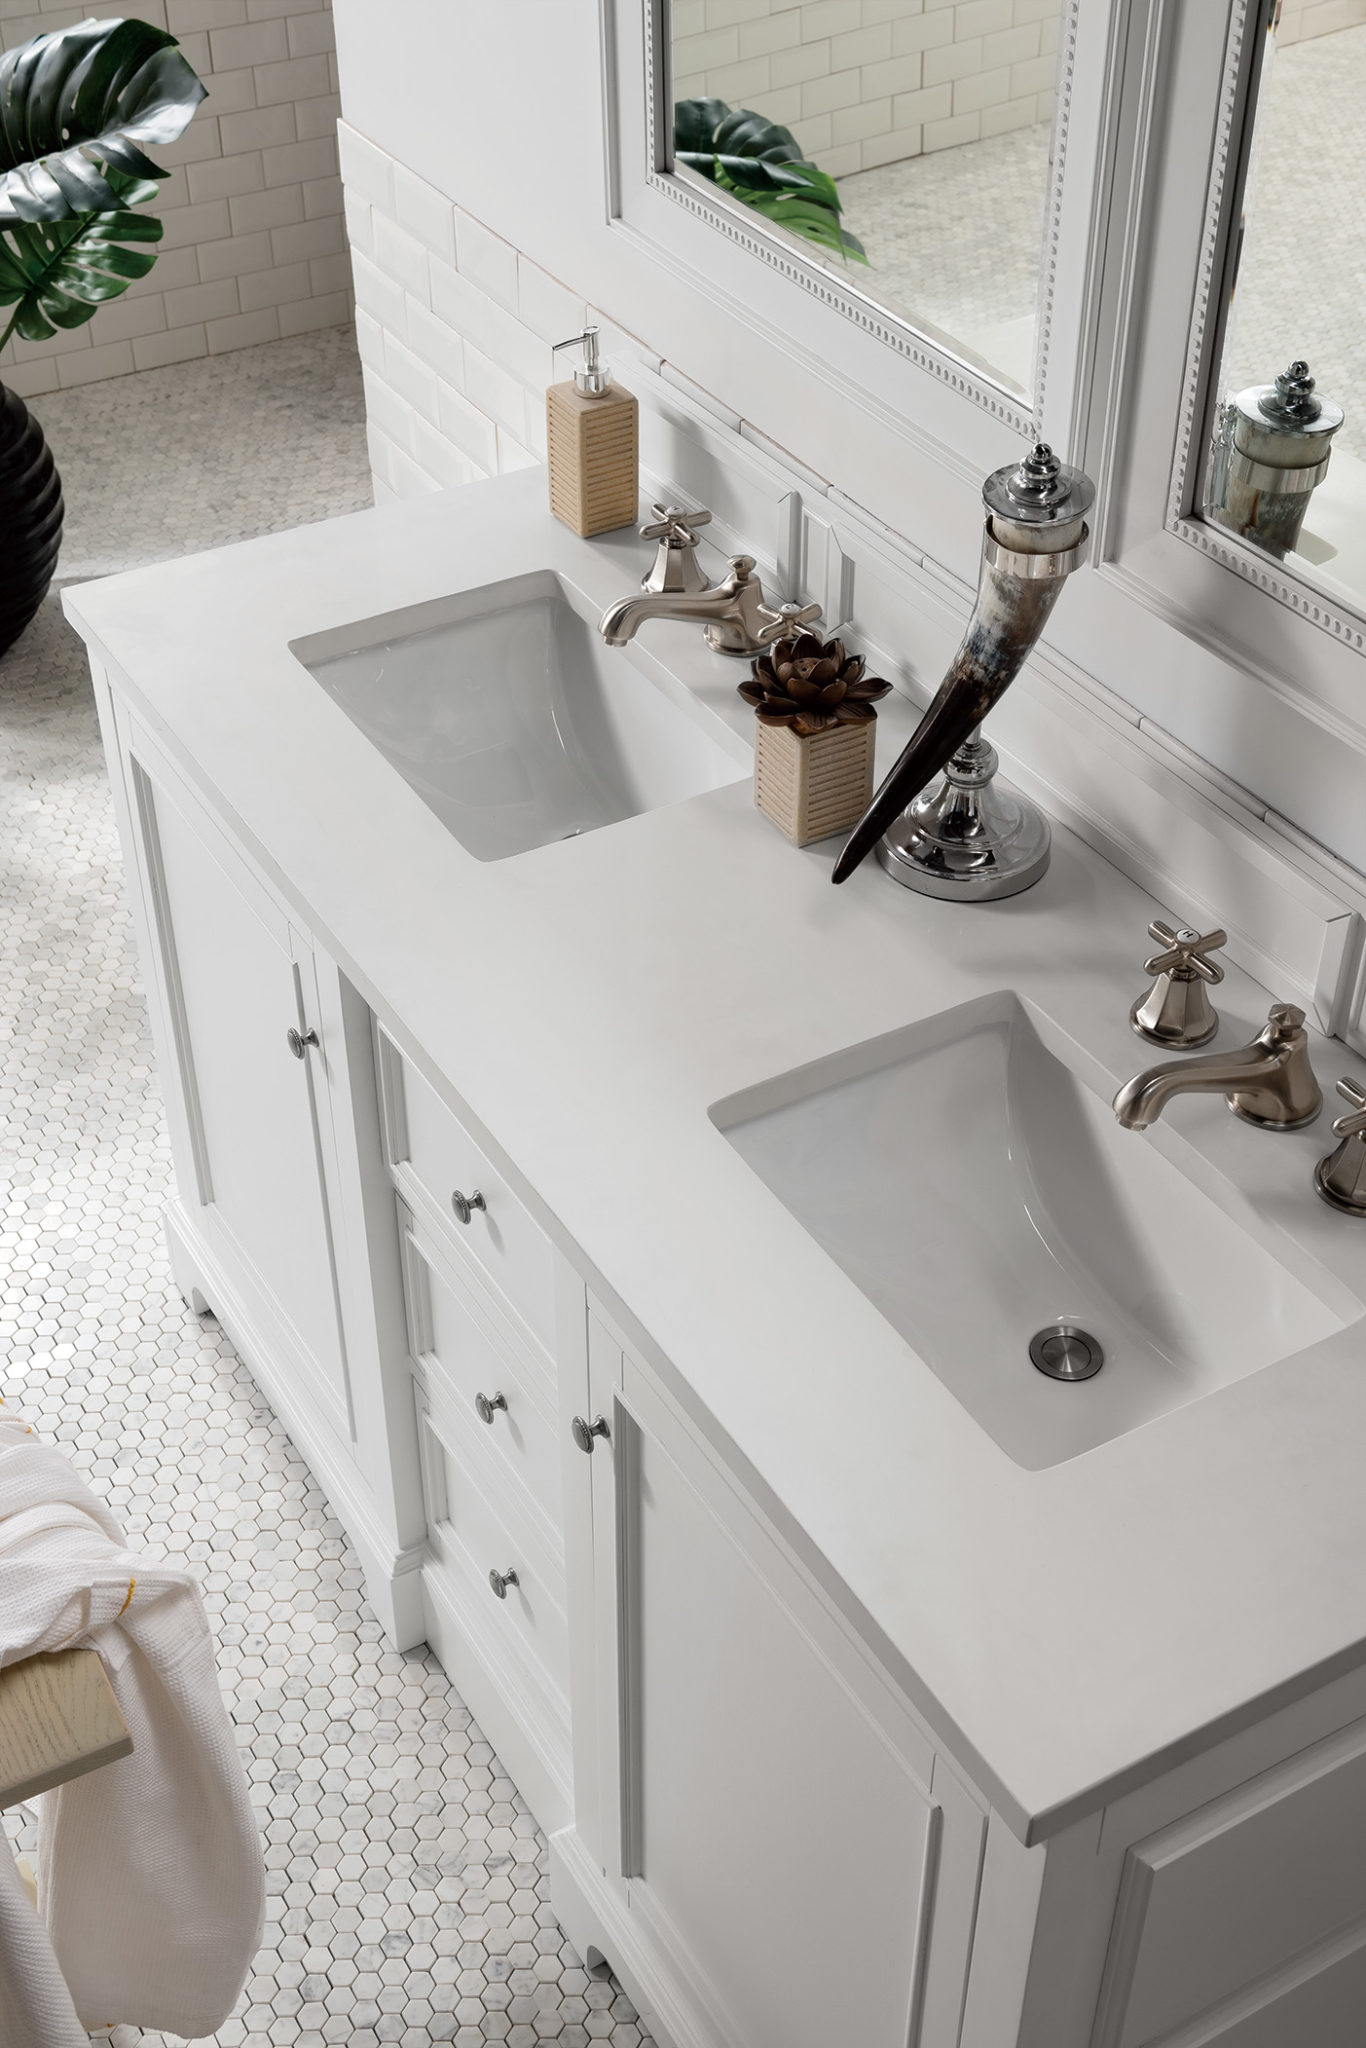 De Soto 60 Double Vanity Bright White With 3 Cm Snow White Quartz